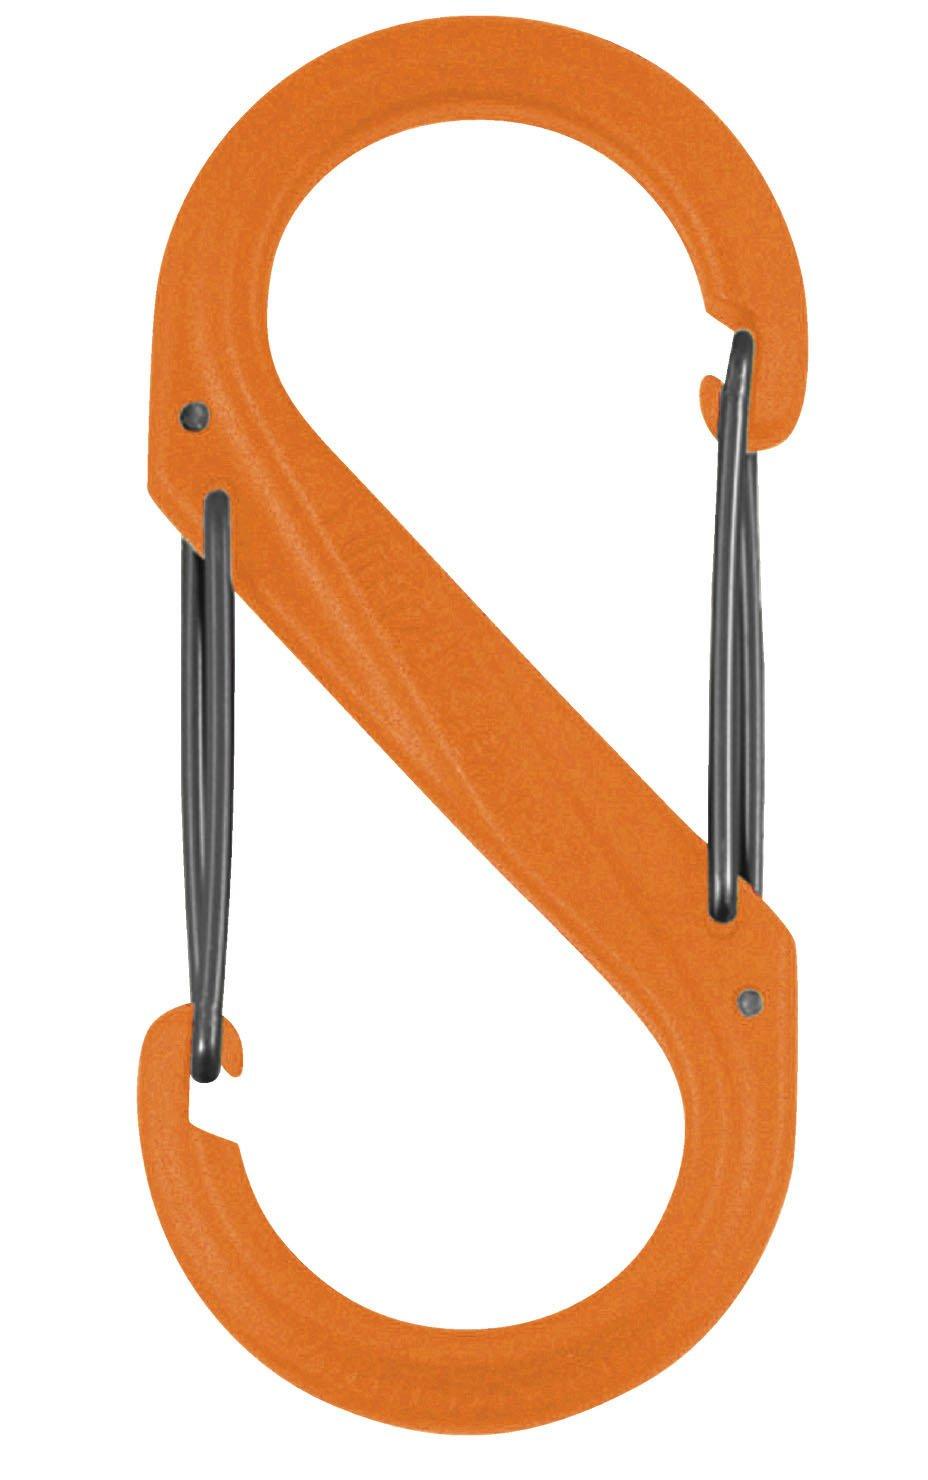 Nite Ize S-Biner Plastic Size #4 -Orange Pkg